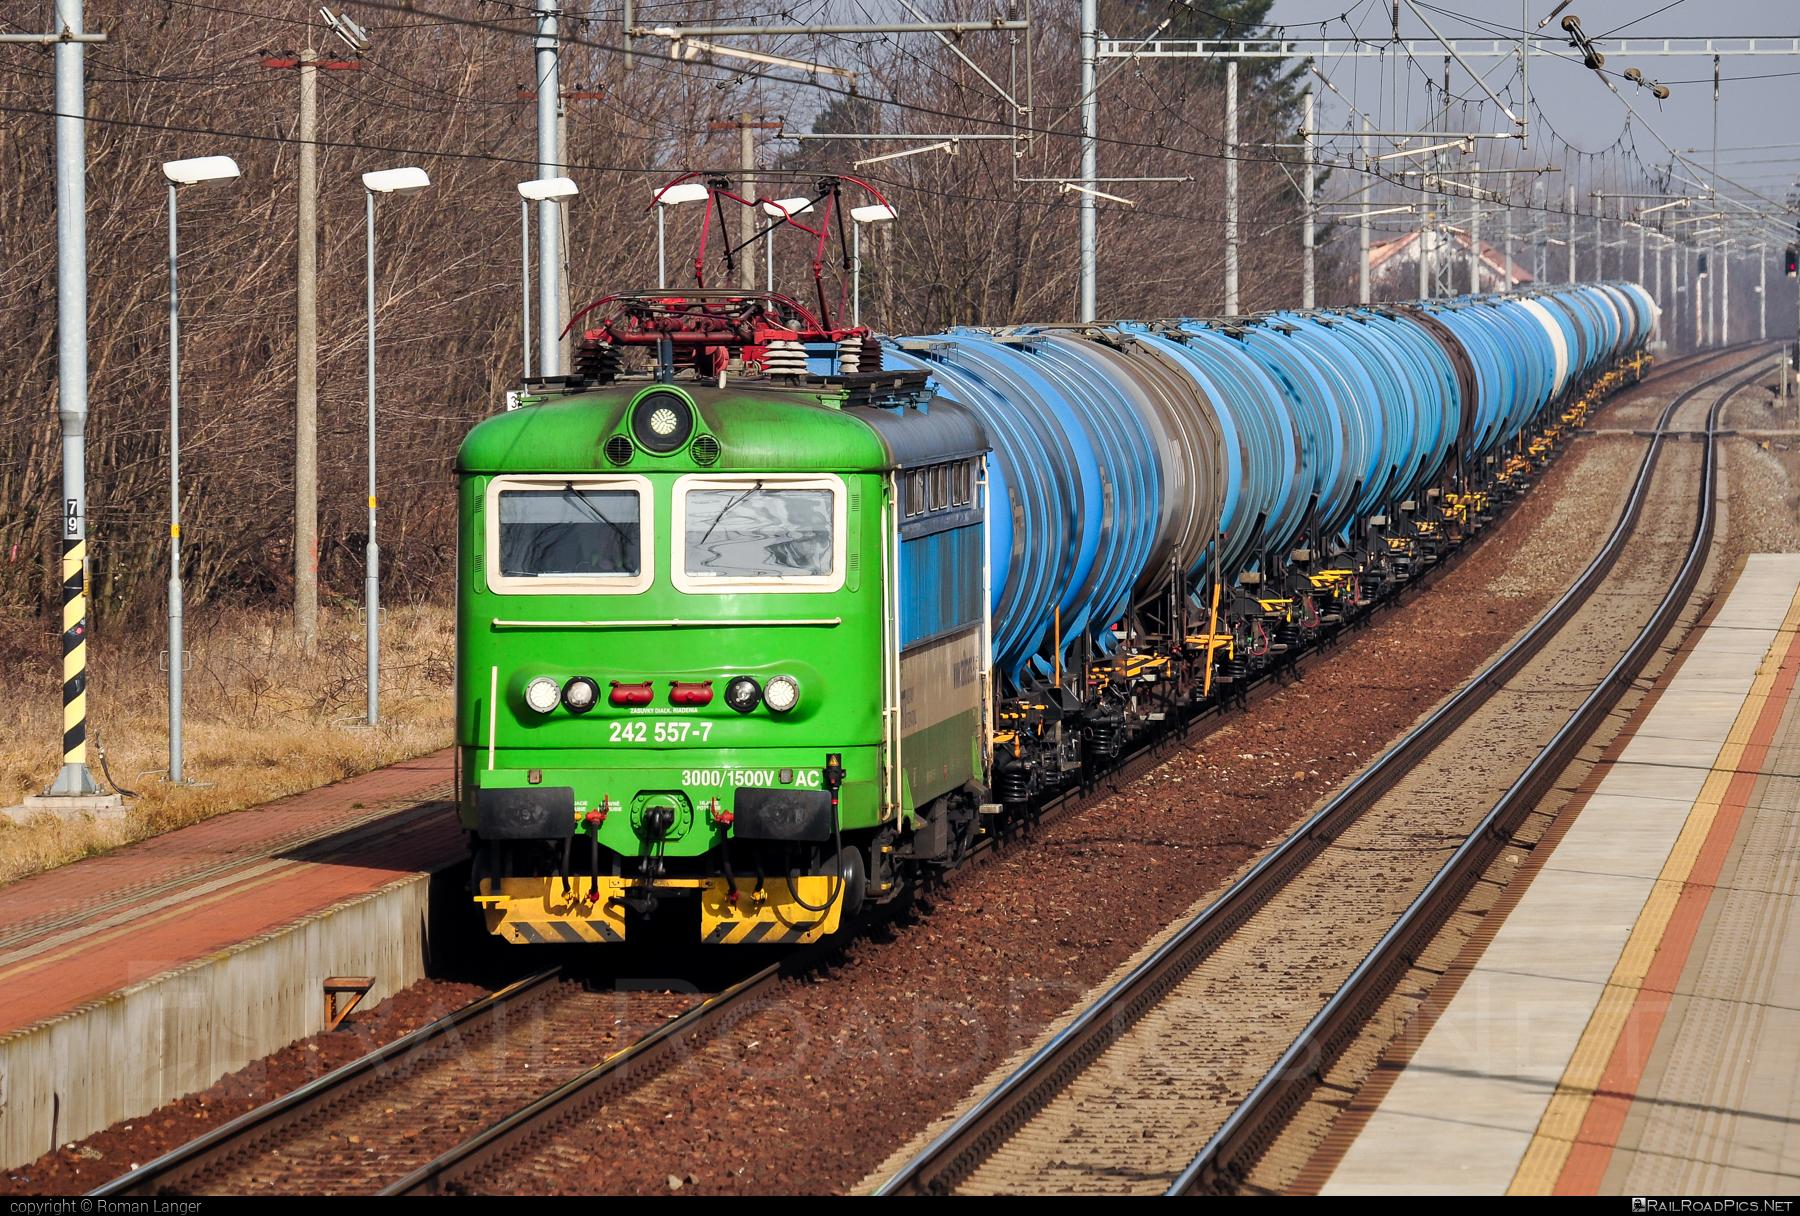 Škoda 73E - 242 557-7 operated by Railtrans International, s.r.o #RailtransInternational #expressgroup #kesselwagen #locomotive242 #plechac #rti #skoda #skoda73e #tankwagon